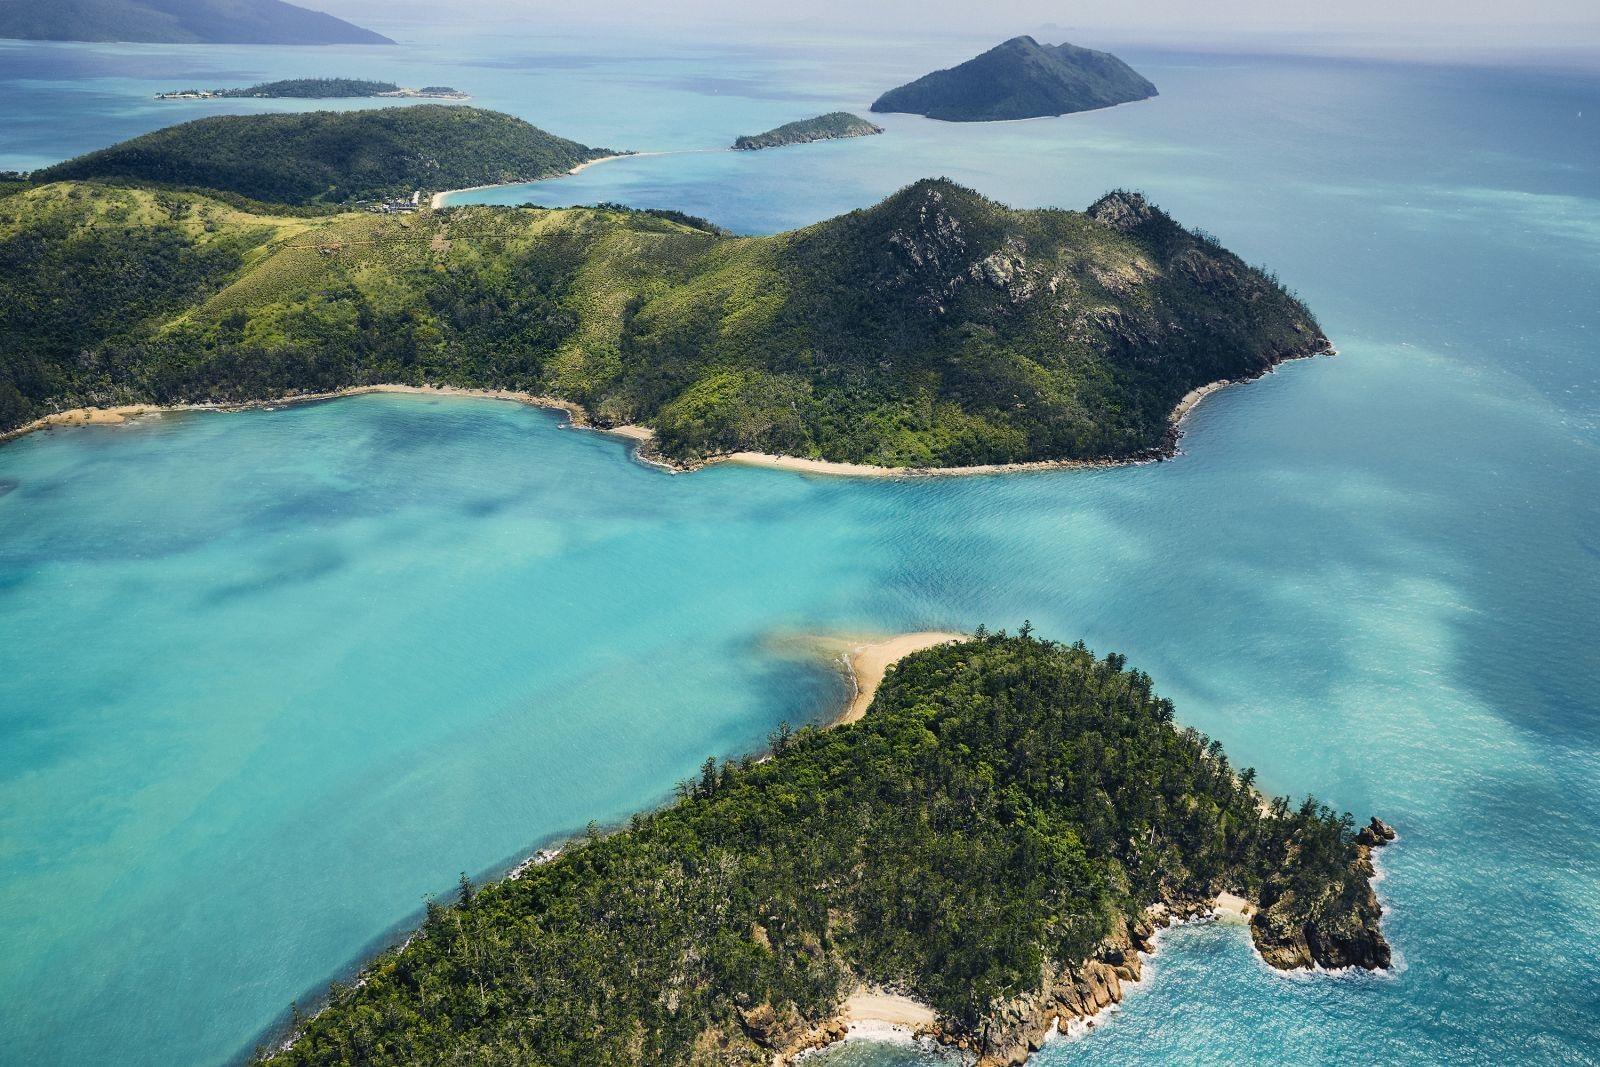 Aerial view of islands in ocean near Daydream Island Resort